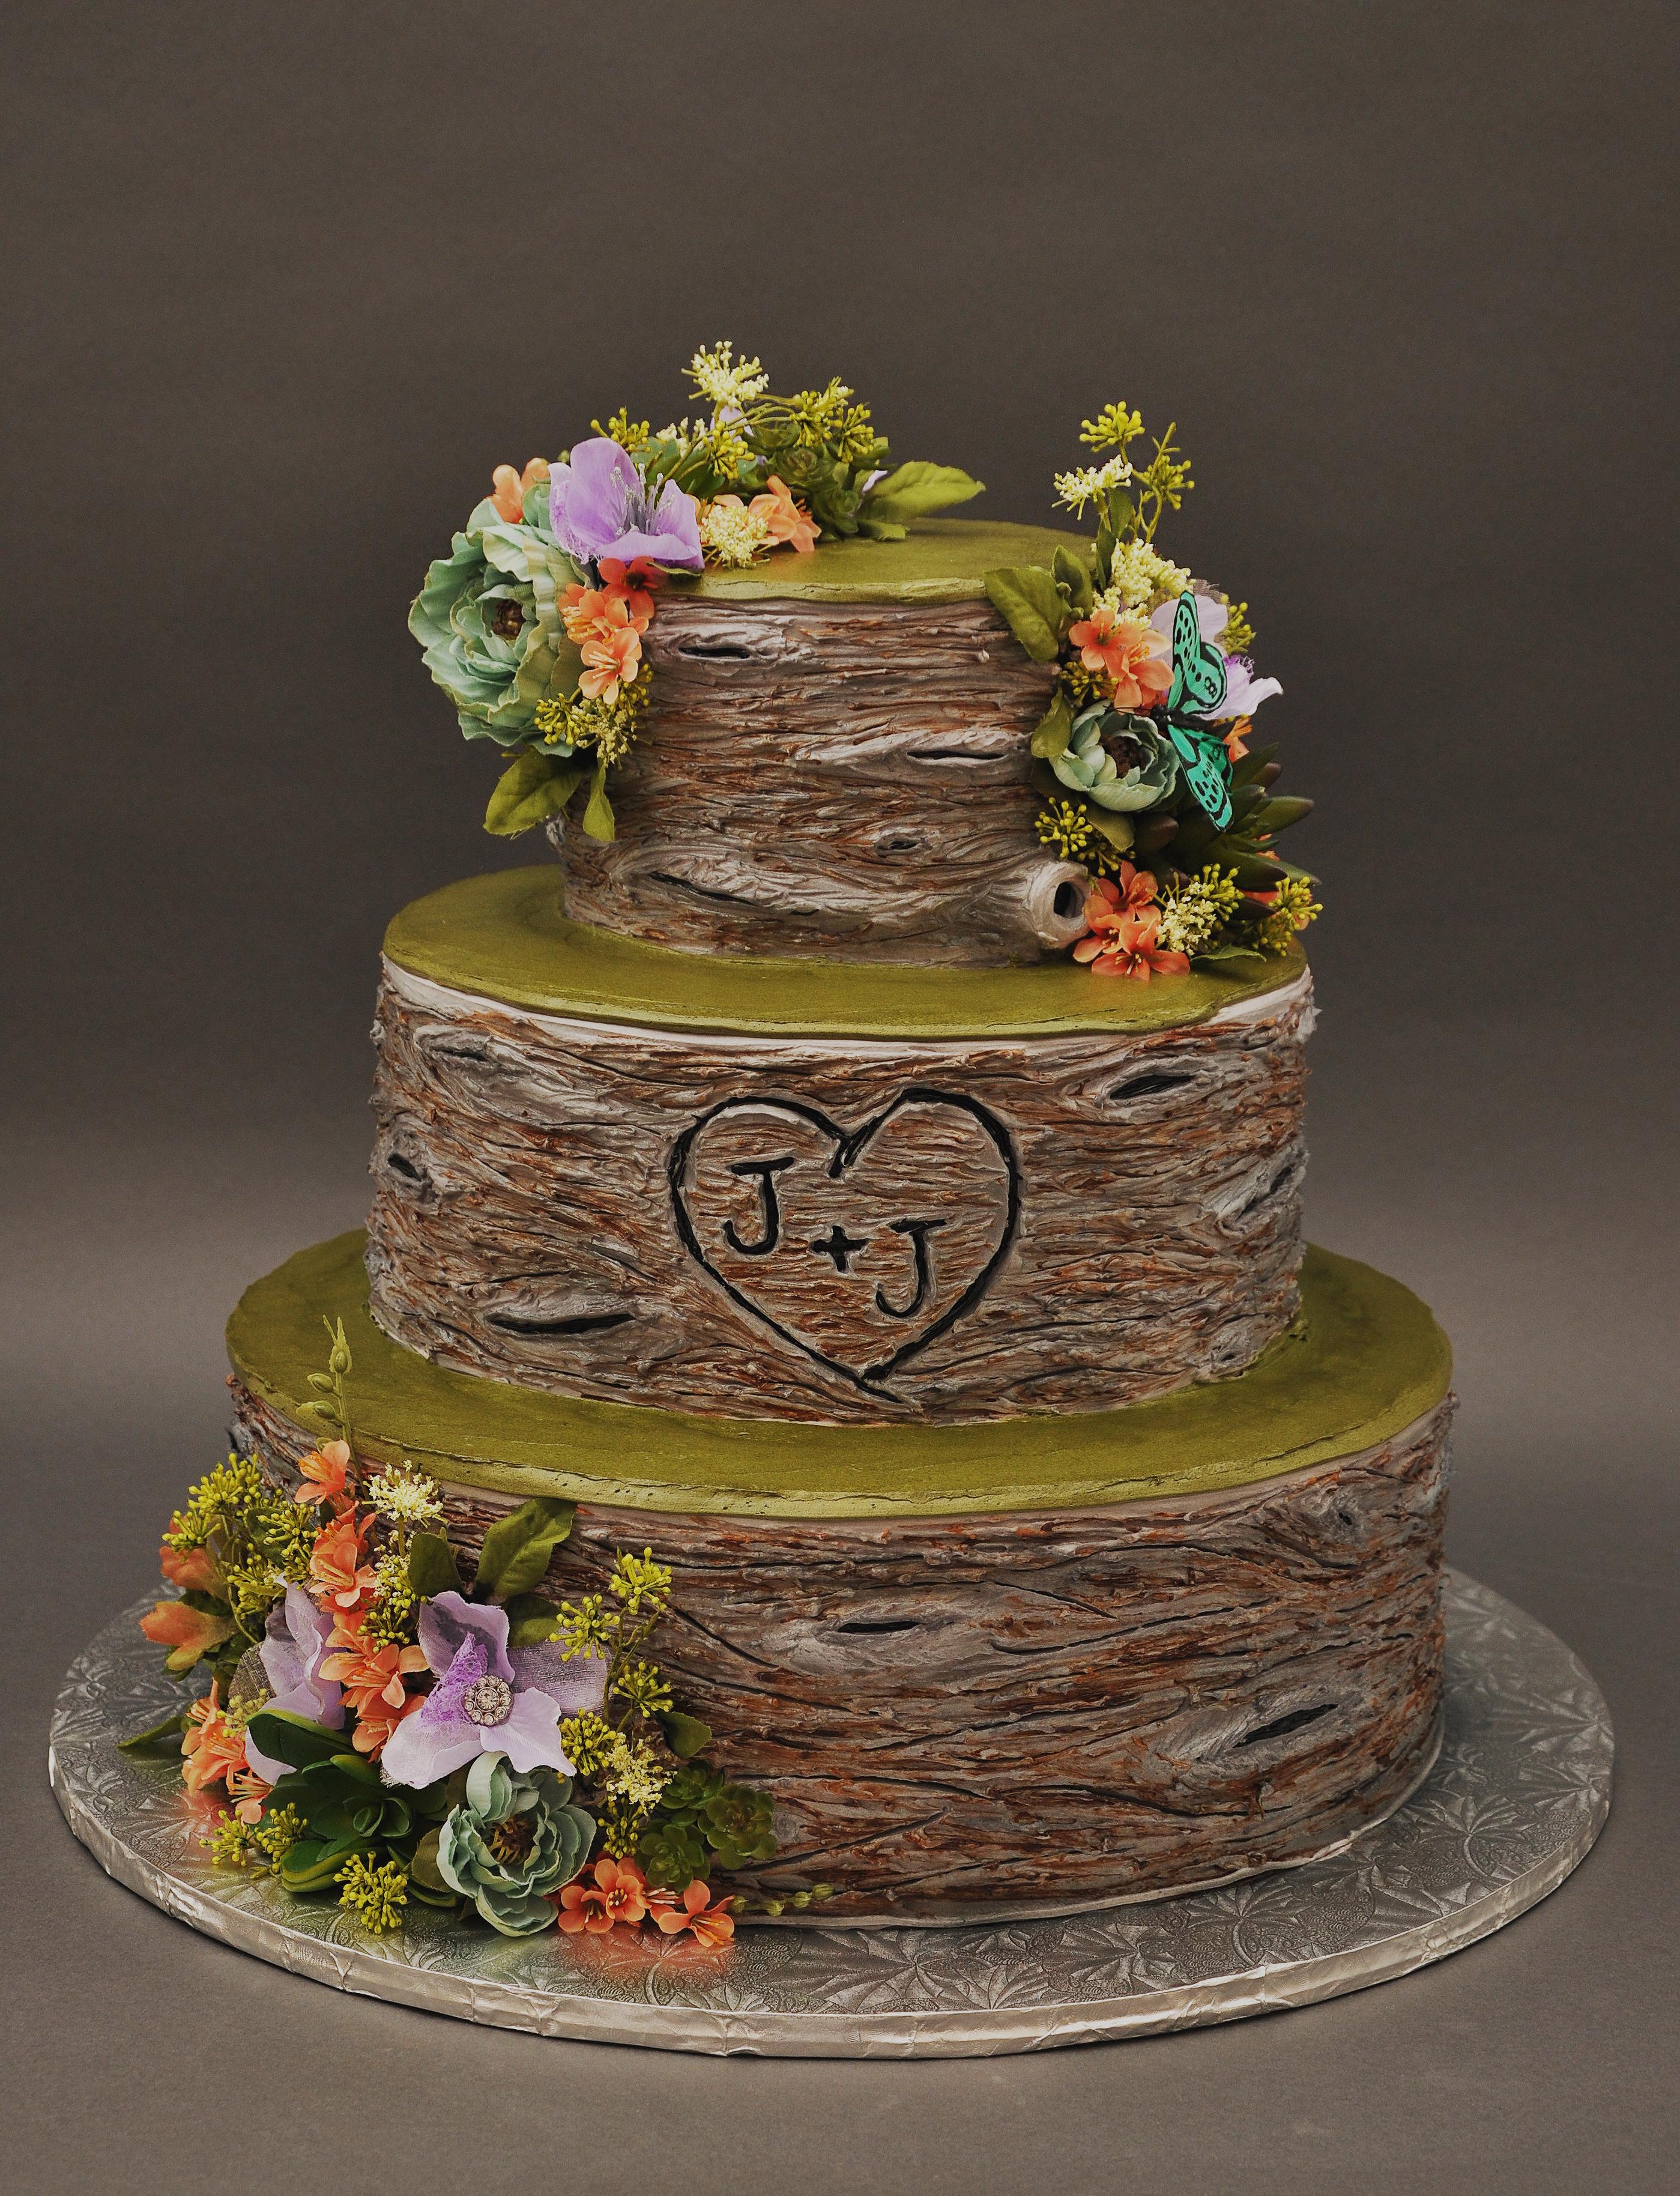 Bethel Bakery Cake Stump